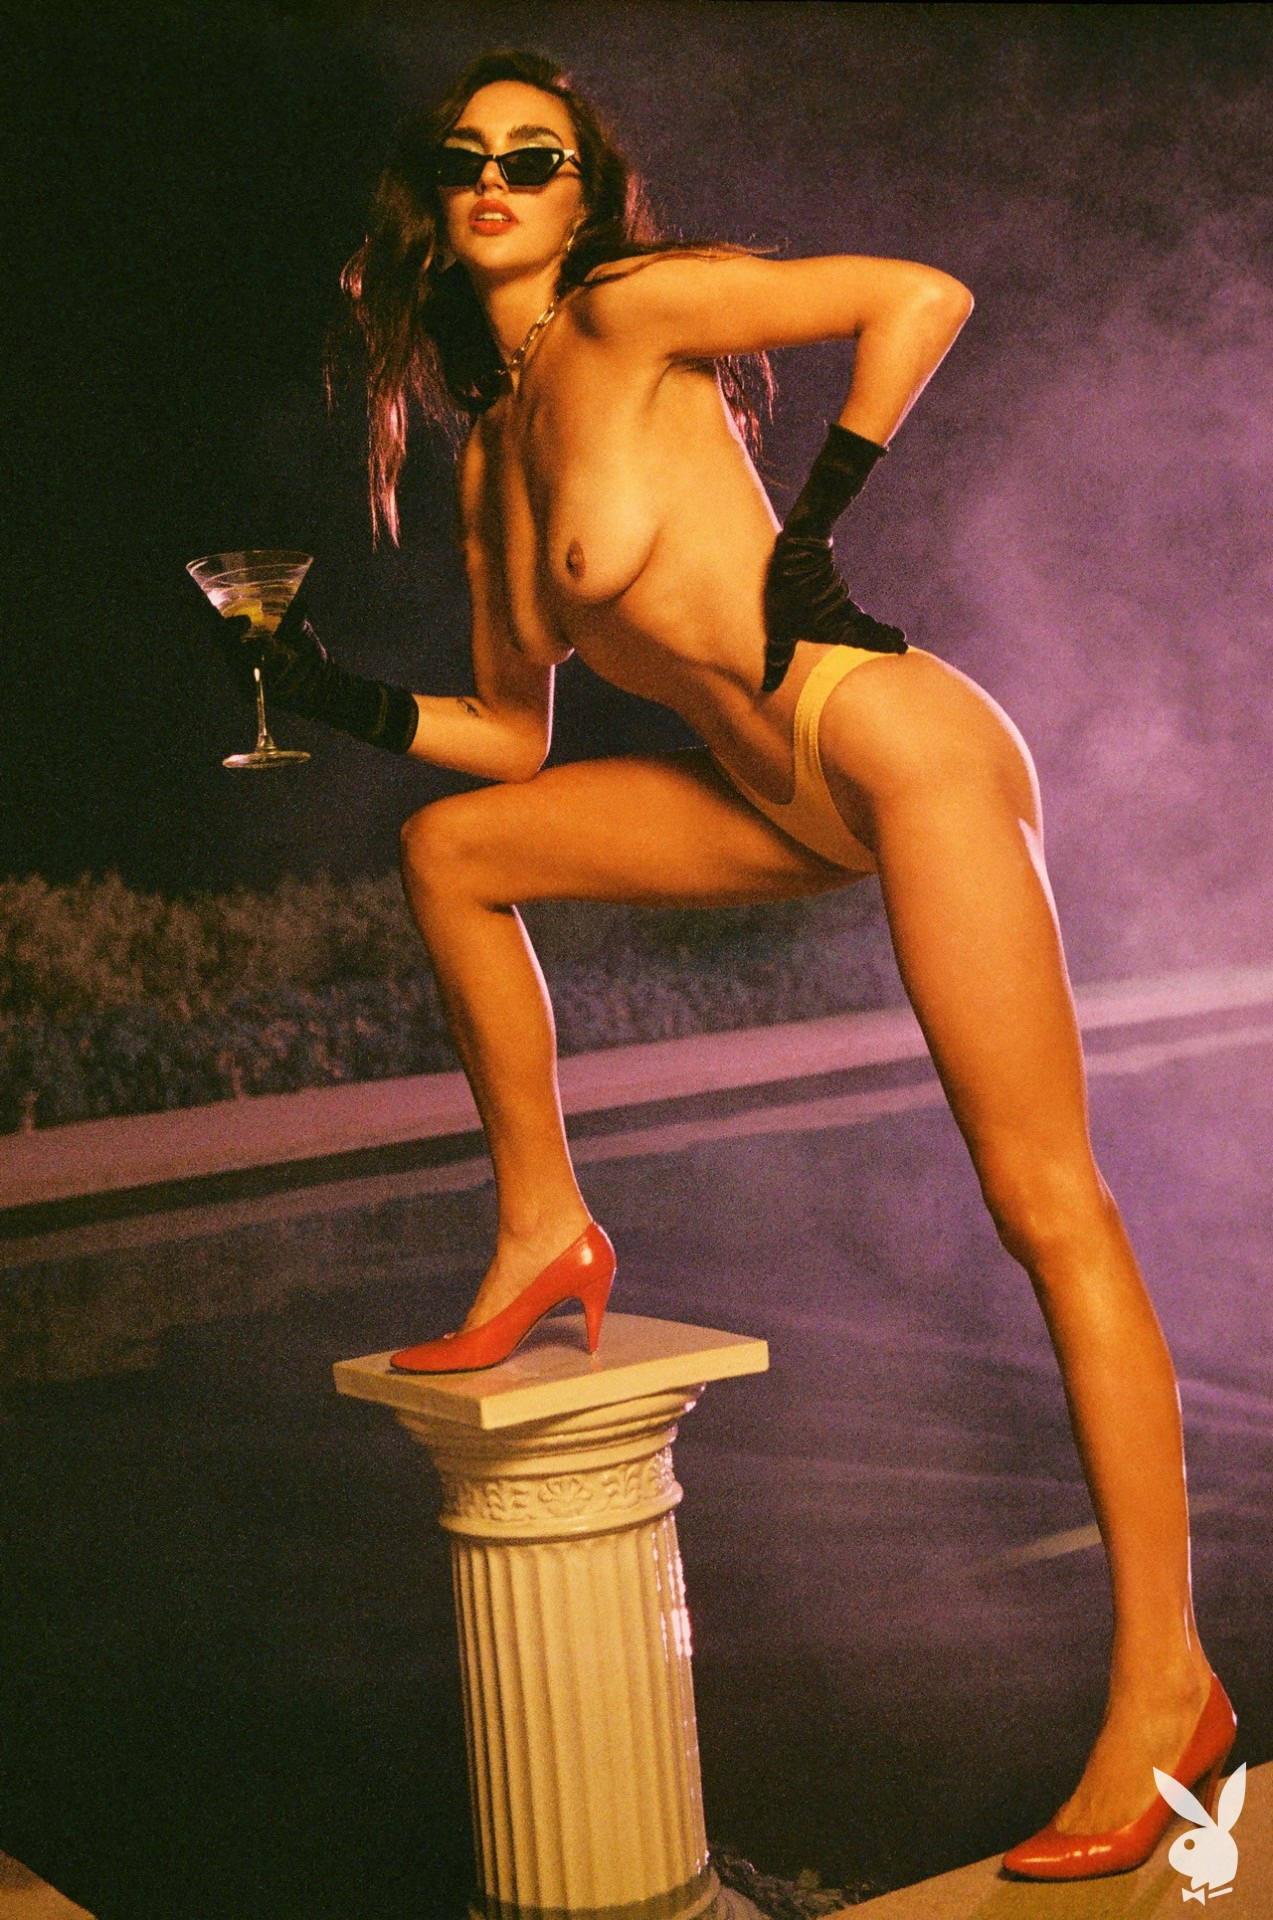 Playmate Spring 2001 Hailee Lautenbach 0016